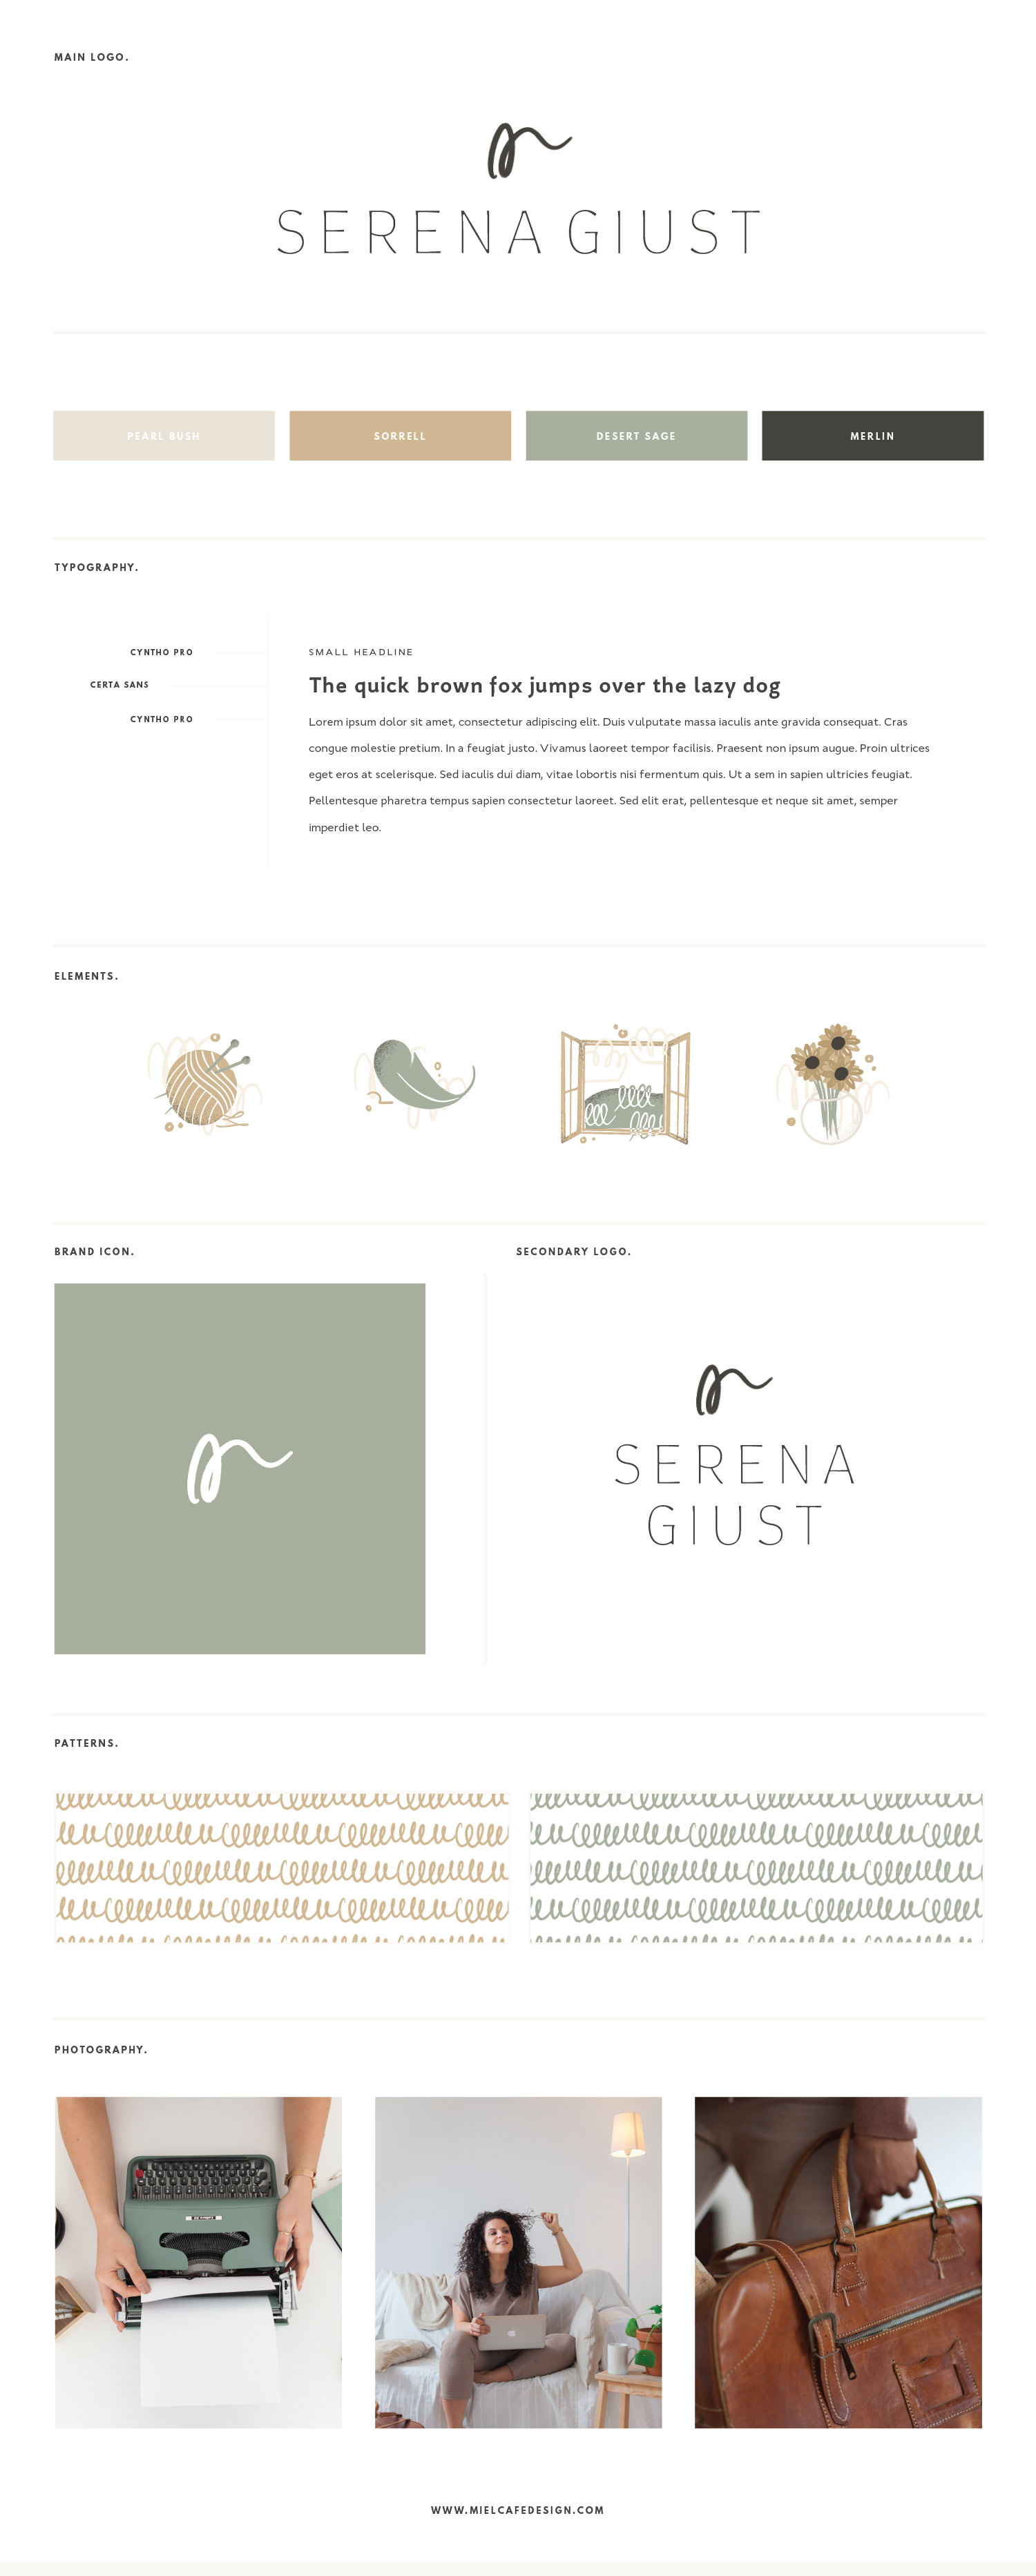 Miel Café Design Portfolio: Brand board minimal e moderna per UX Writer Serena Giust